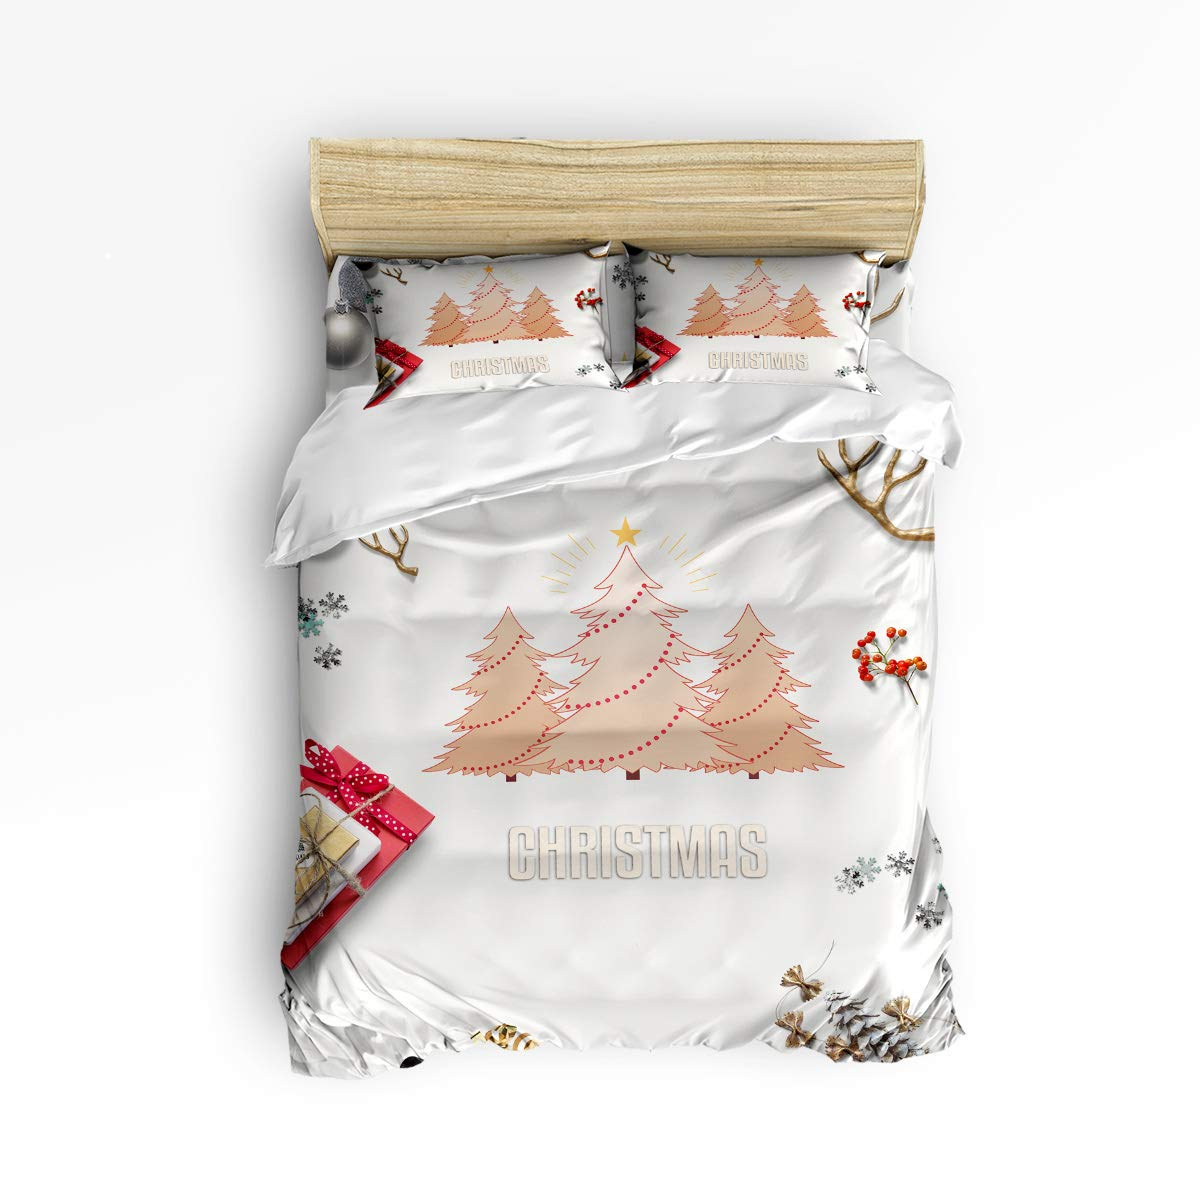 BABE MAPS 掛け布団カバーセット メリークリスマステーマ かわいい漫画柄 ウルトラソフト 通気性 非常に丈夫なツイルフラシ天 4点セット 子供/キッズ/ティーン/大人用 Queen Size LTT20181125BMSJTBCSSWTQ01202SJTCBMS B07KVD6XBZ Christmas Treebms8577 Queen Size